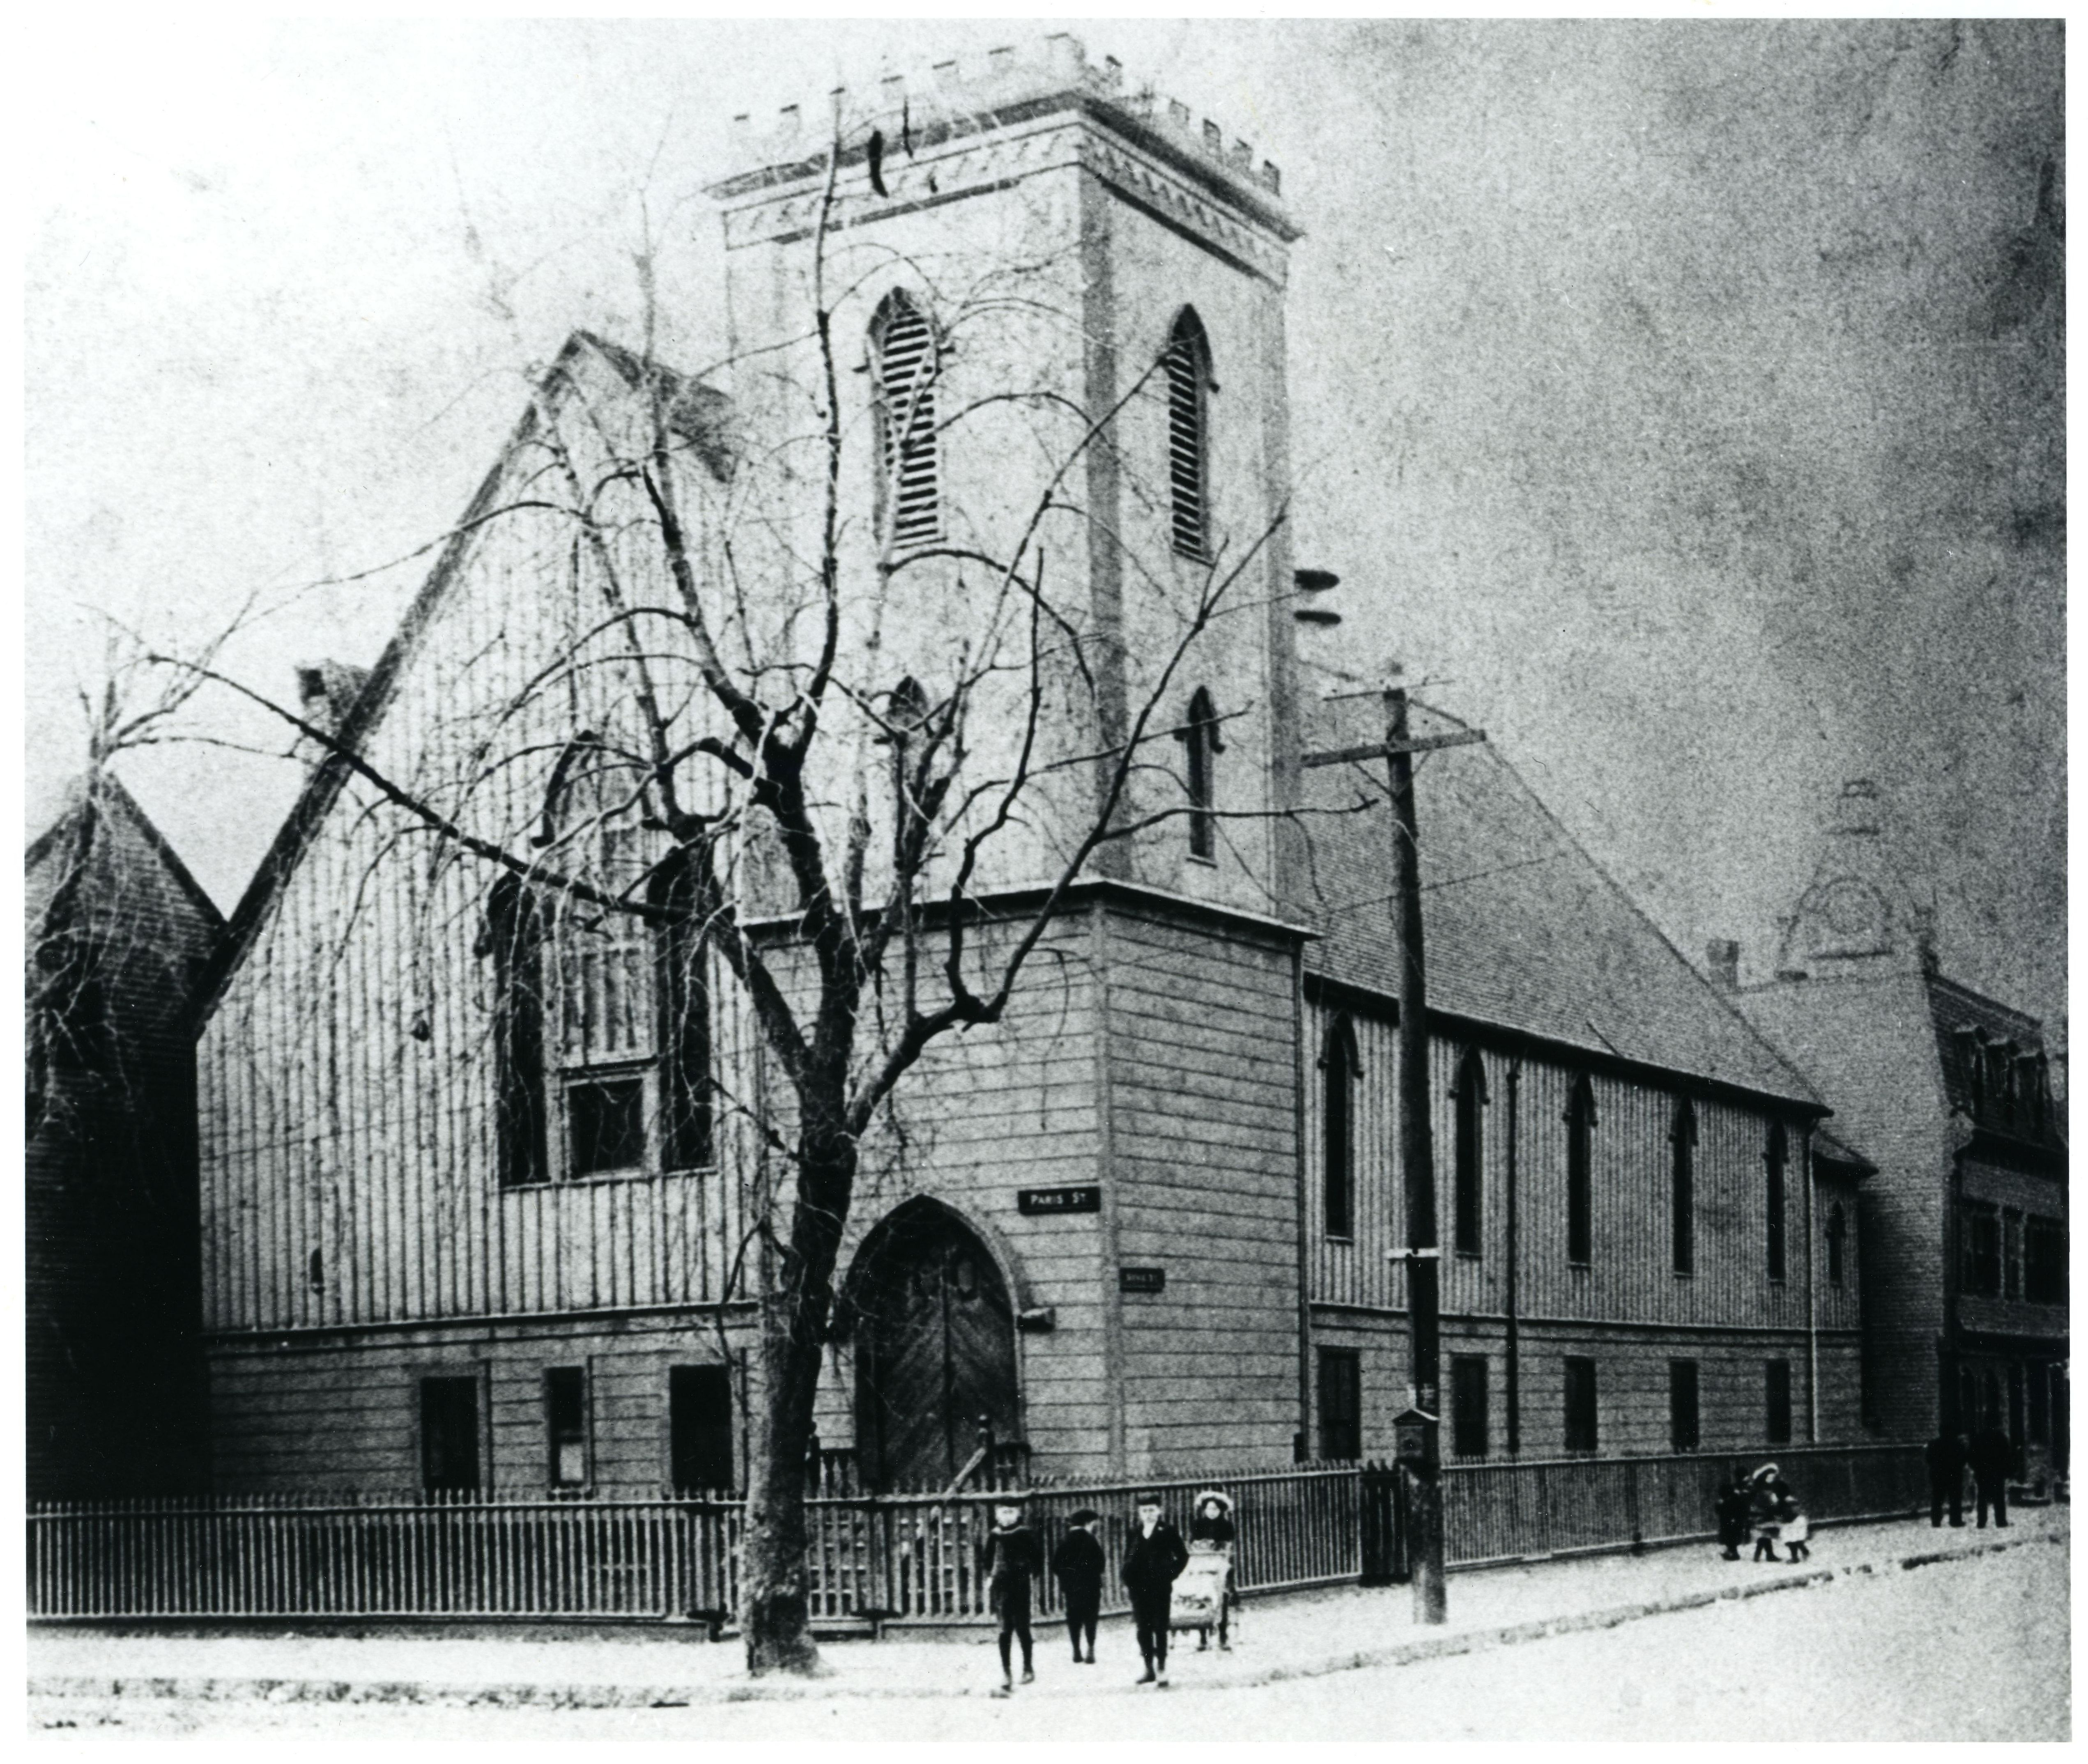 Jews in East Boston